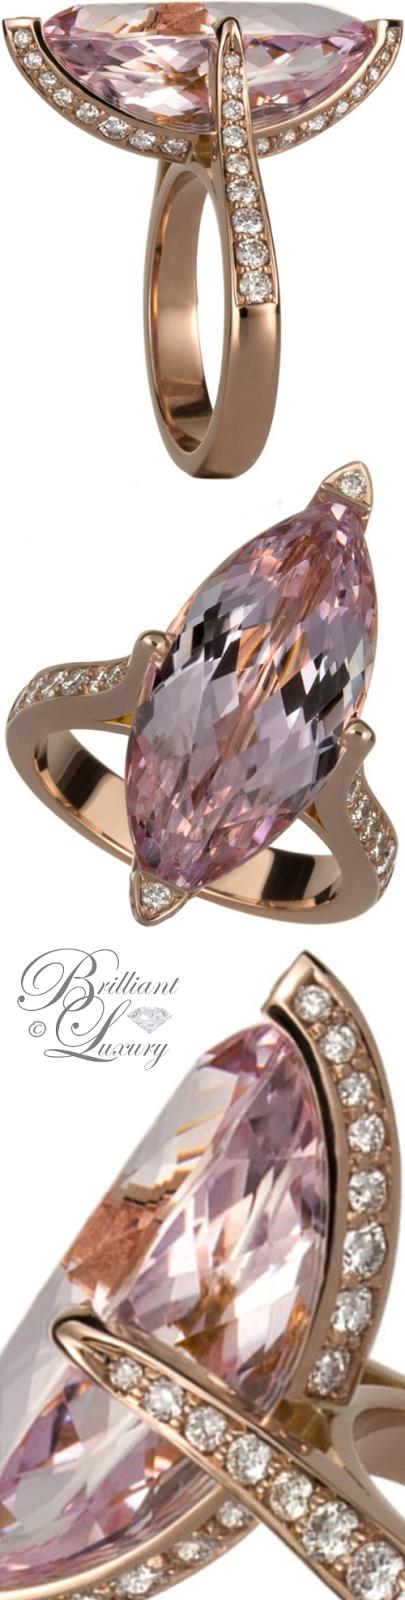 Brilliant Luxury ♦ Bobby White Mora Ring